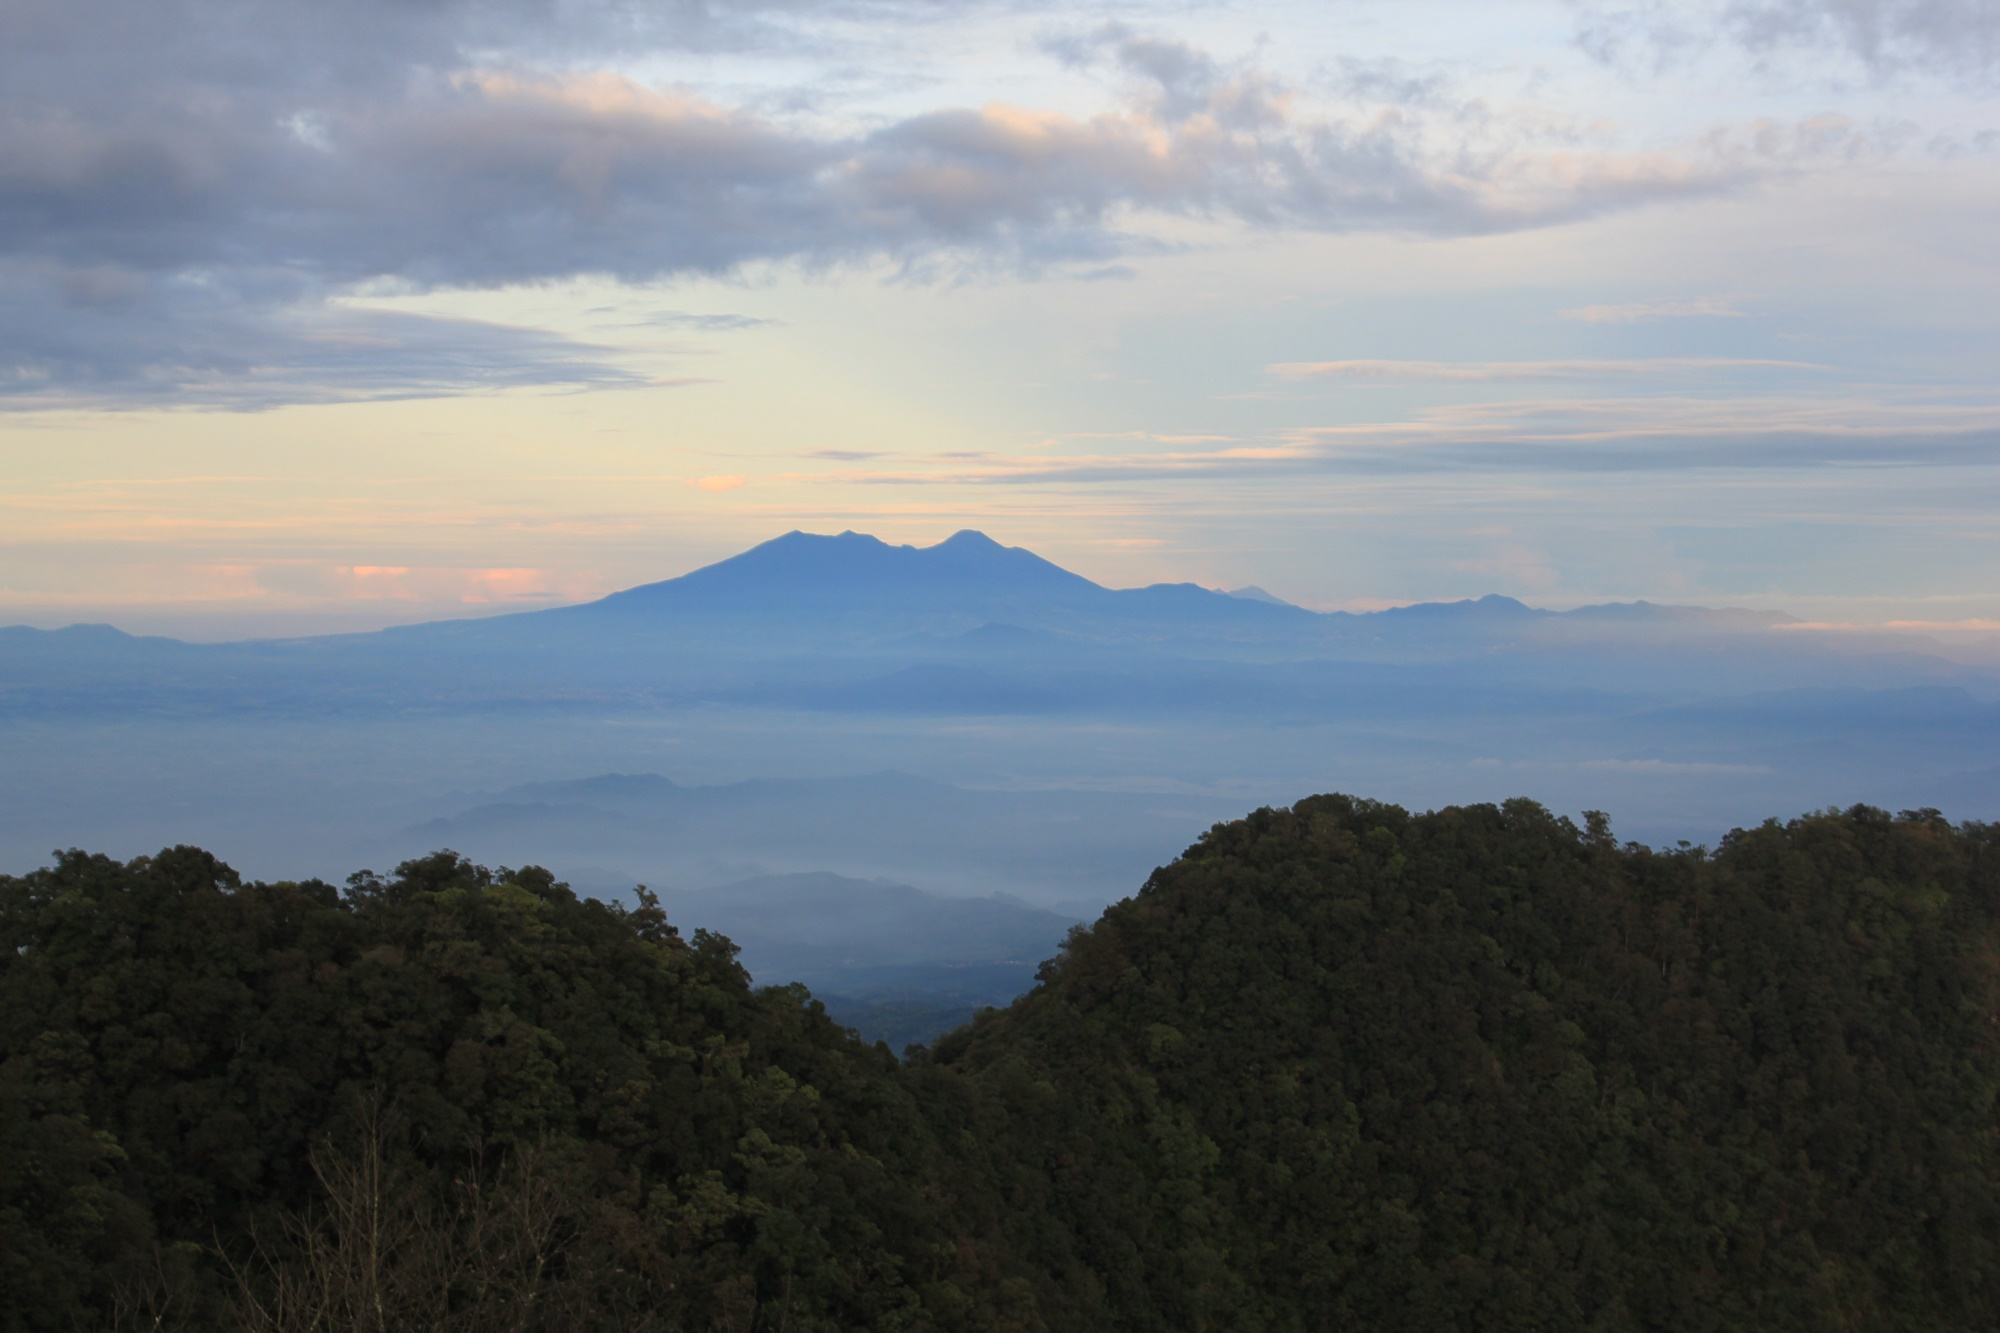 Siluet Pemandangan Gunung Tangkuban Perahu dari Gunung Burangrang